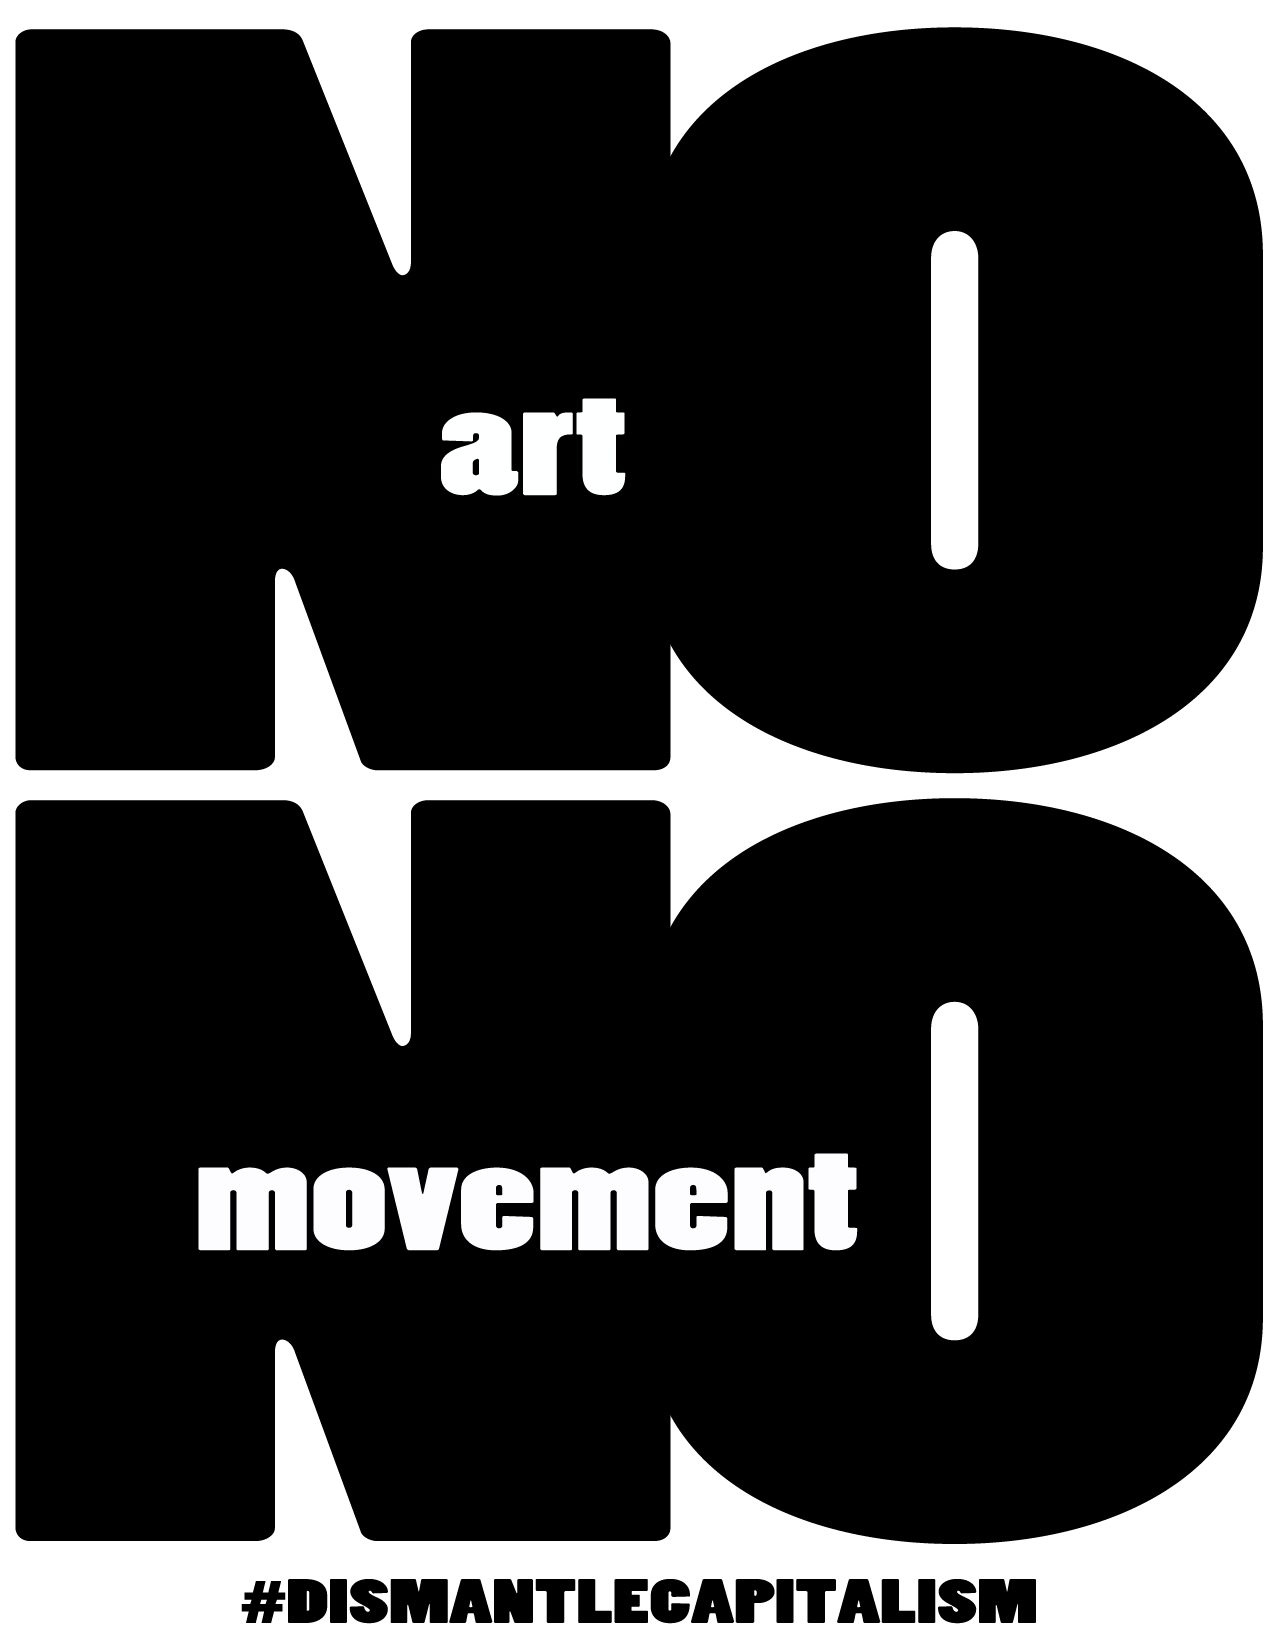 artist dismantle capitalism posters propoganda-02.jpg